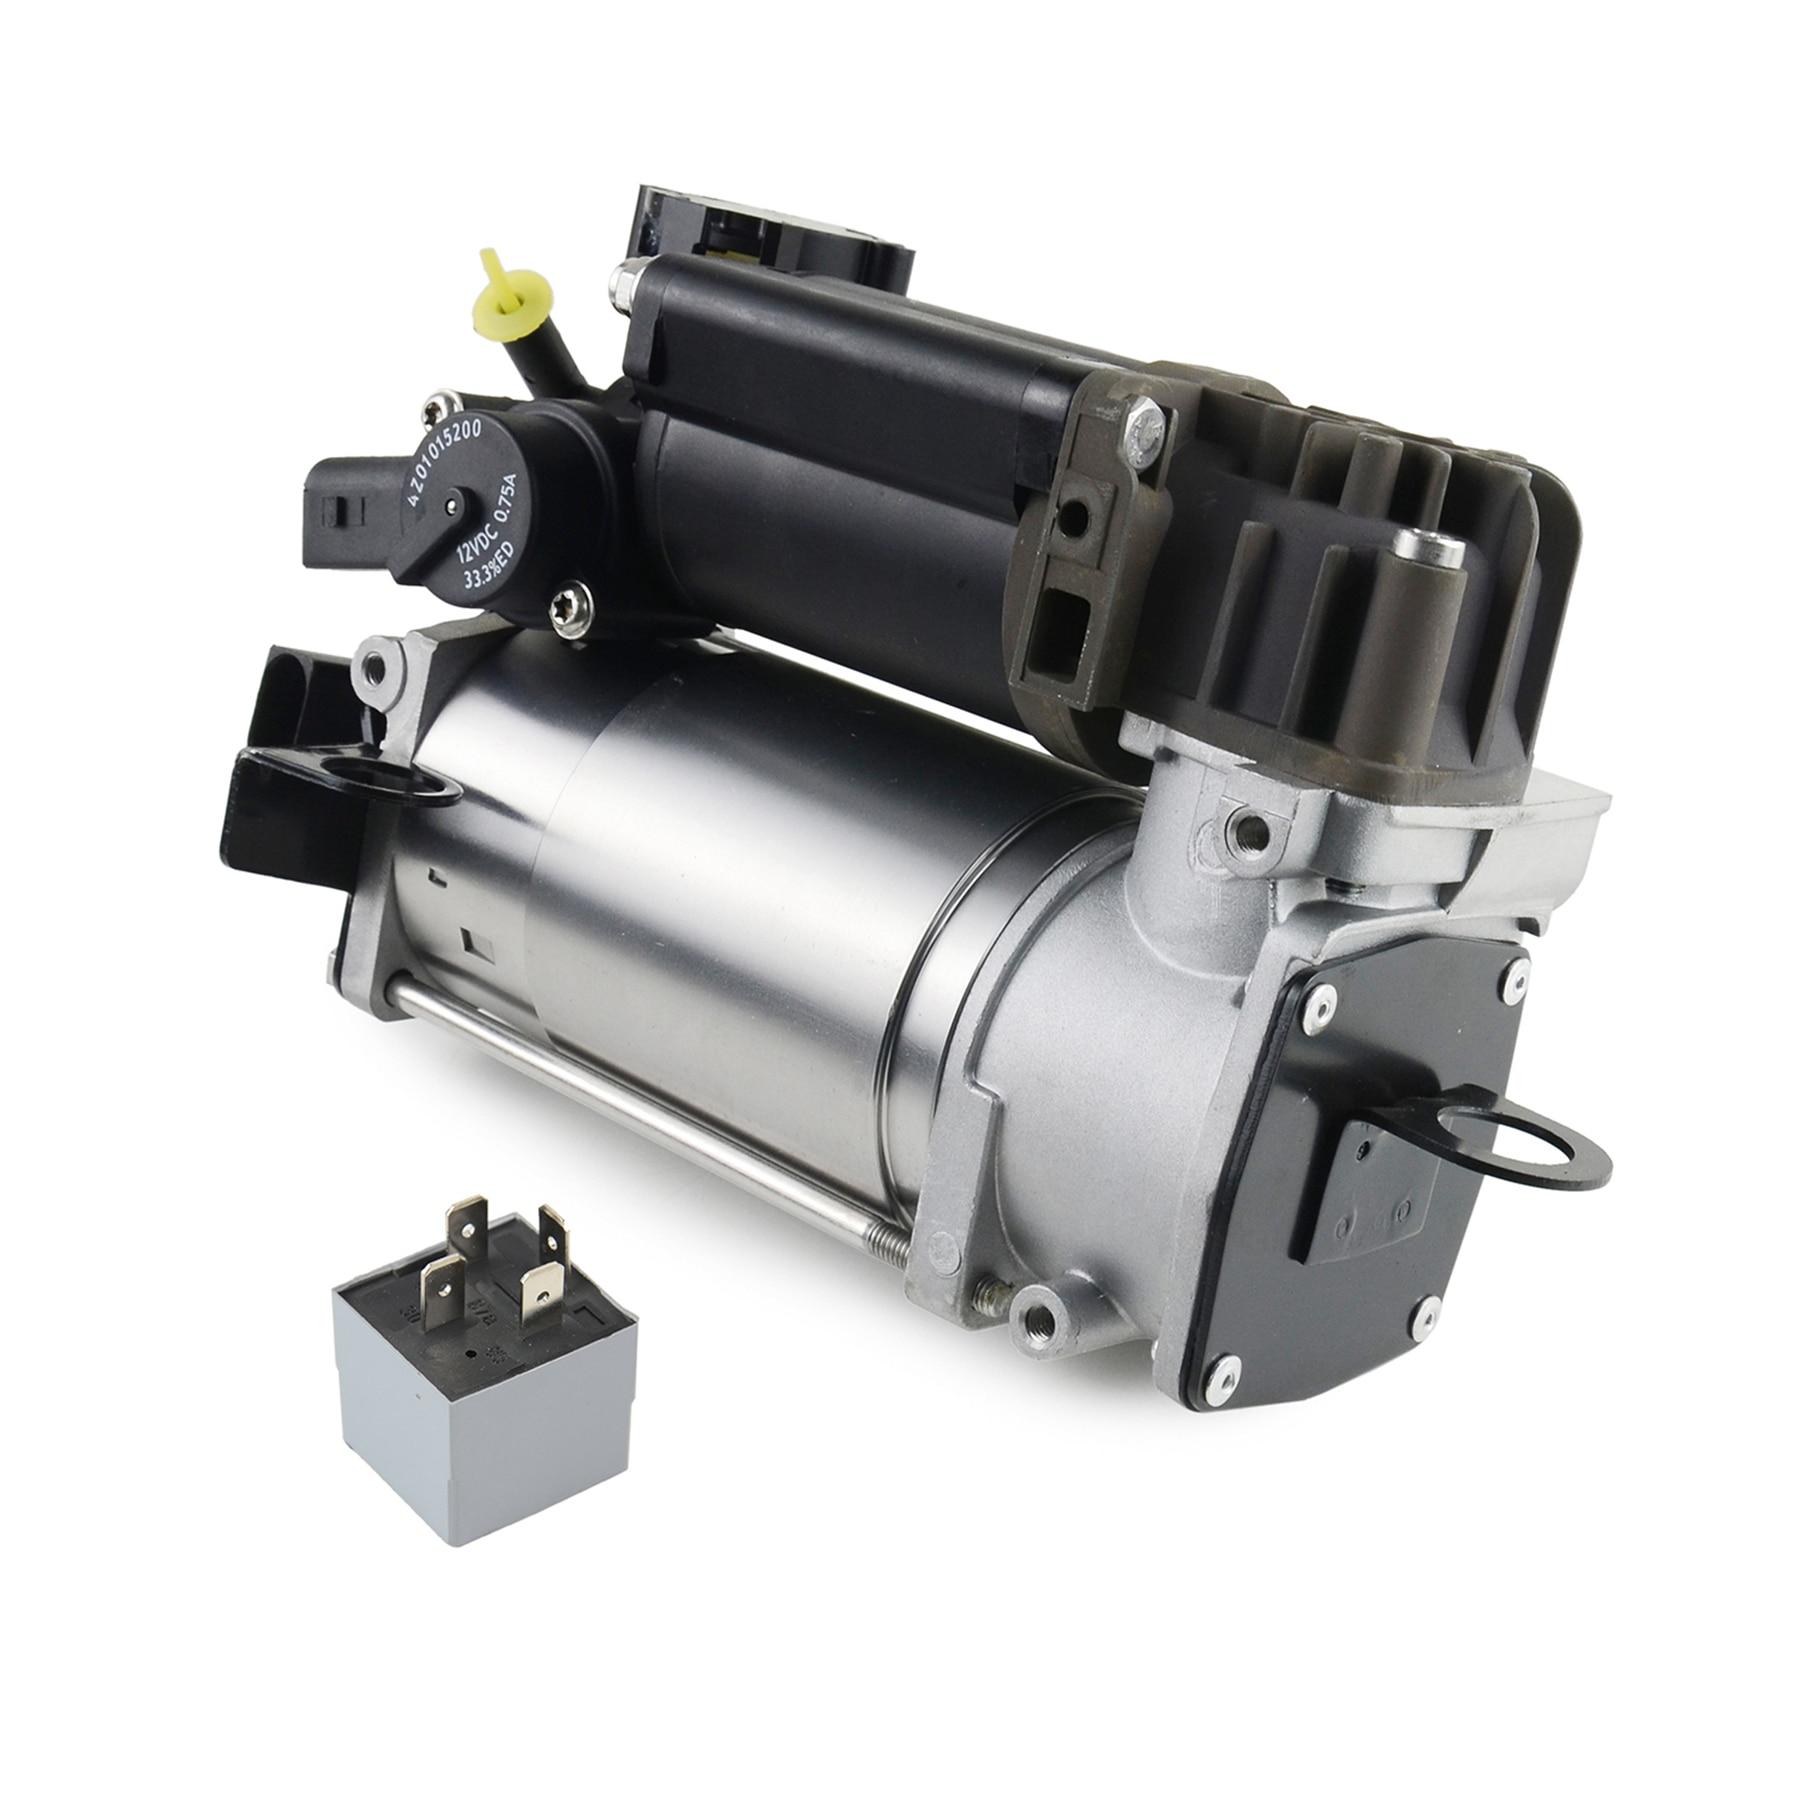 AP02 الهواء تعليق مضخة الضاغط لمرسيدس W220 W211 S211 W219 C219 E550 S500 S430 Airmatic 2113200104 2203200104